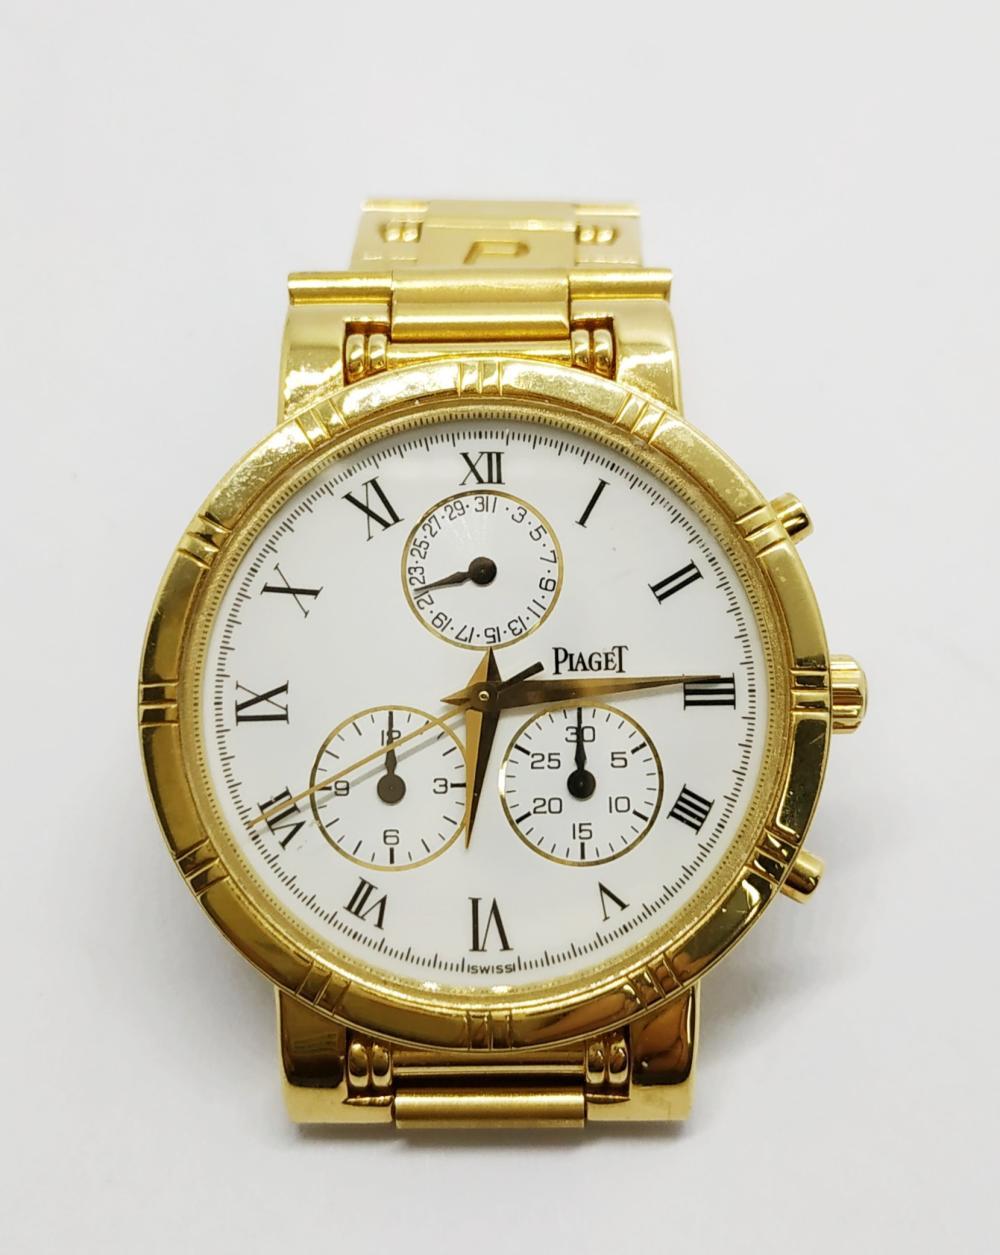 An 18 Karat Yellow Gold Haute Complication Wristwatch, Piage